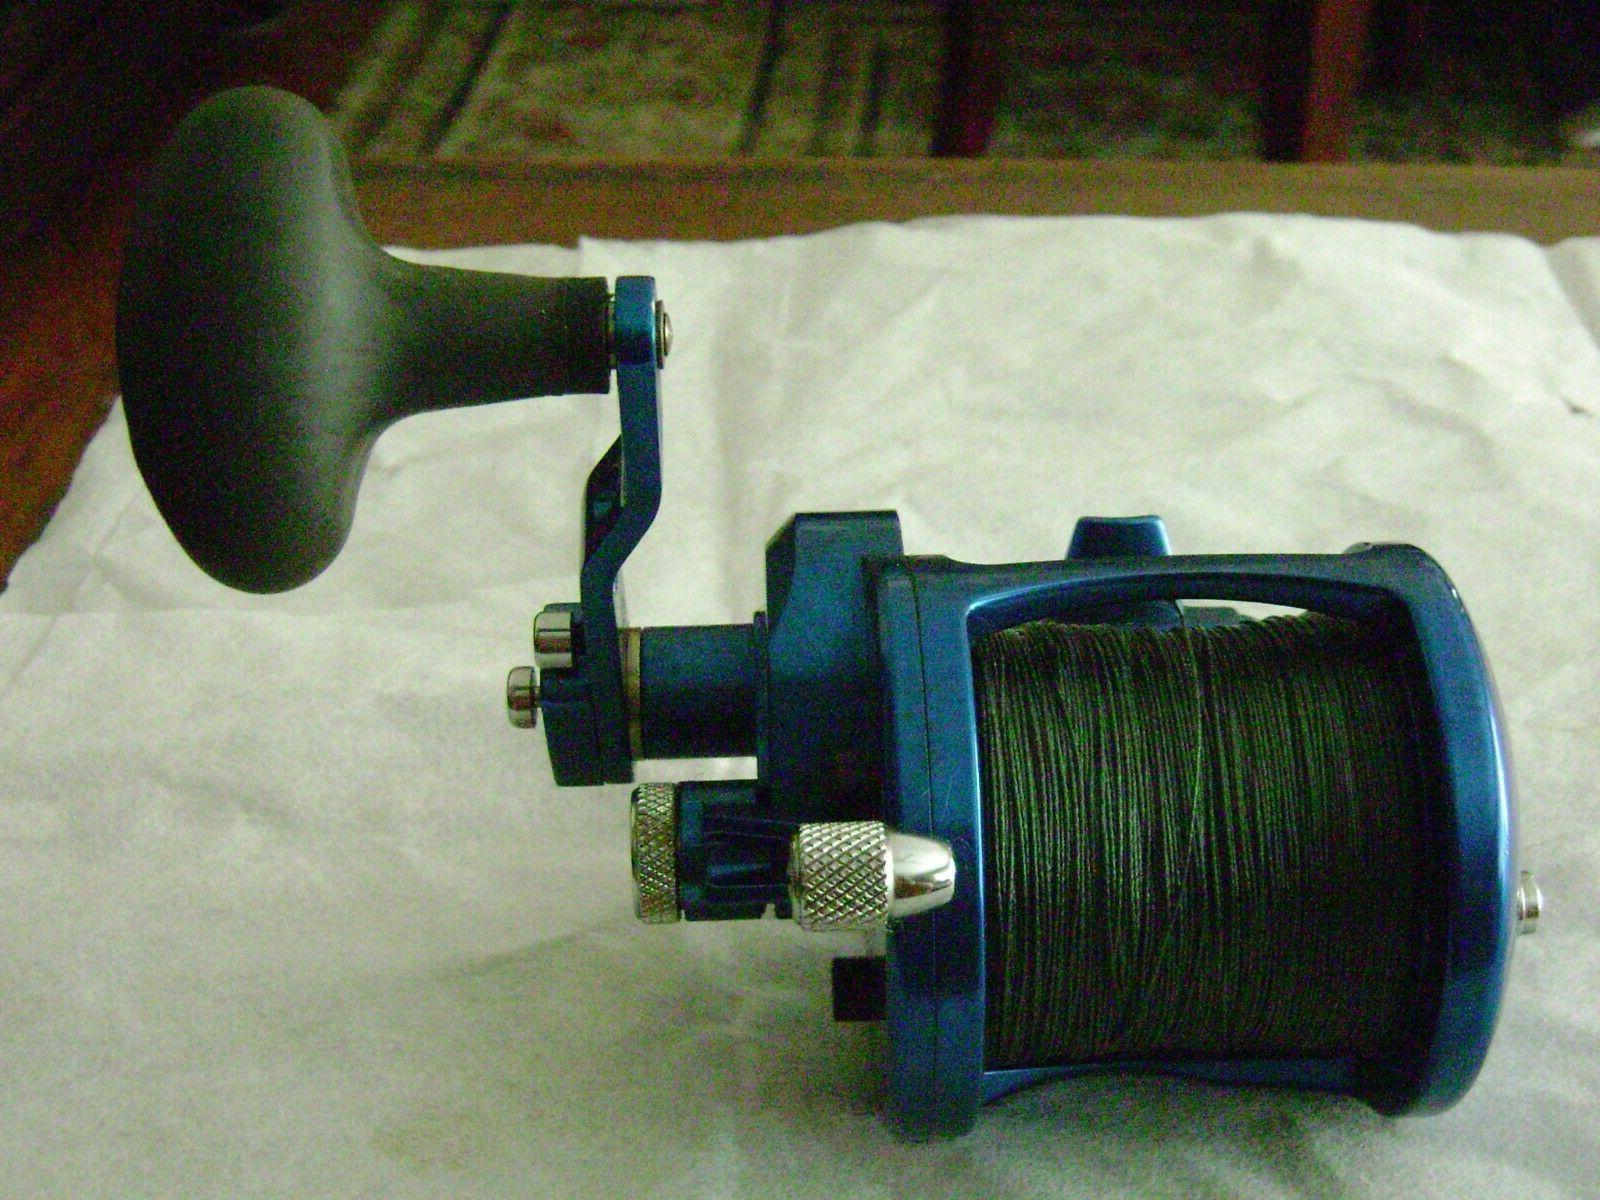 AVET BLUE - 2 SPEED LX6/3 - LEVER DRAG - SALTWATER FISHING R